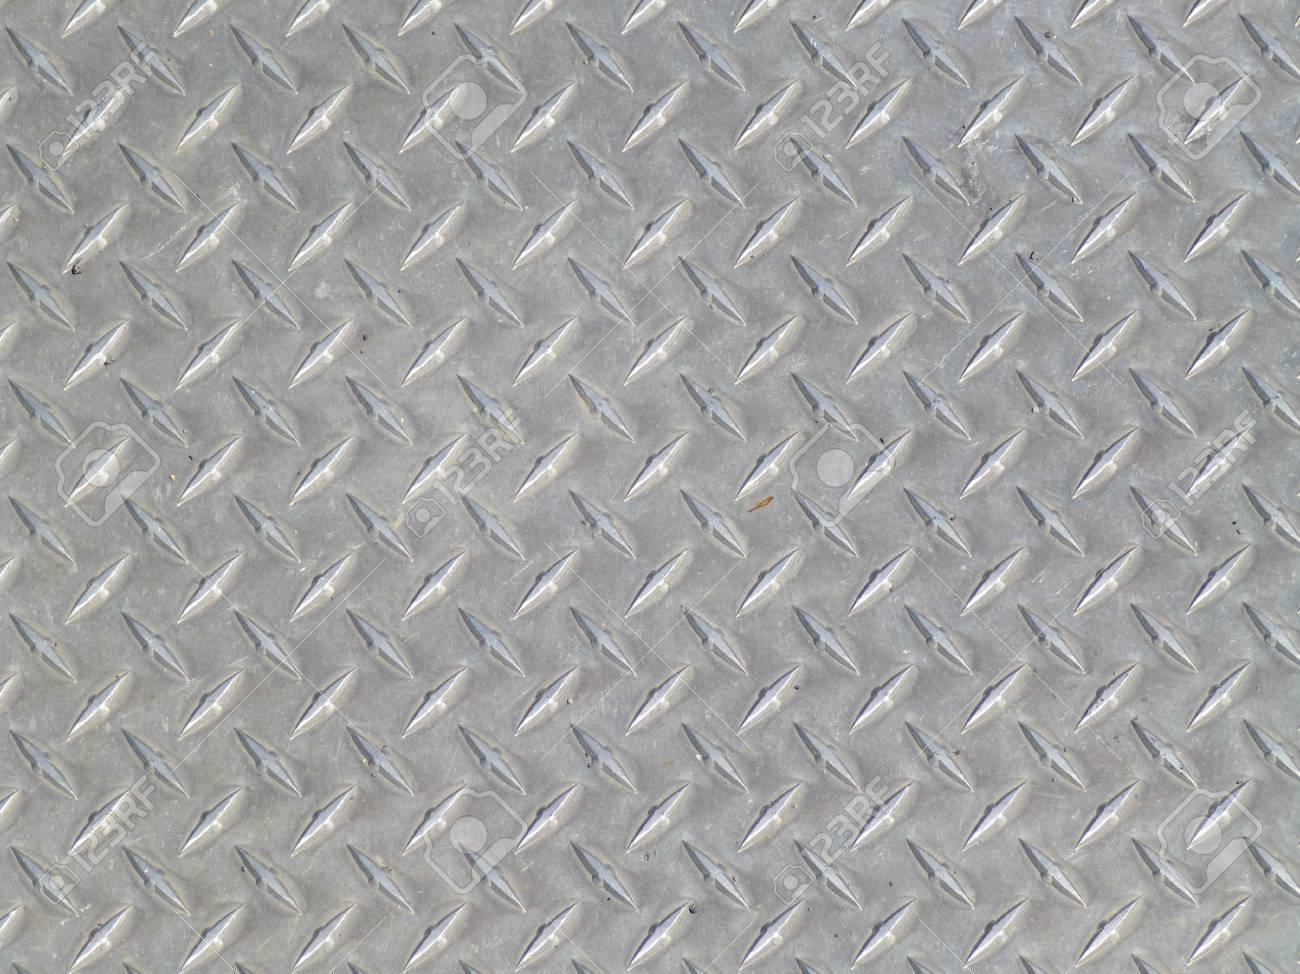 metal plate Stock Photo - 19603872